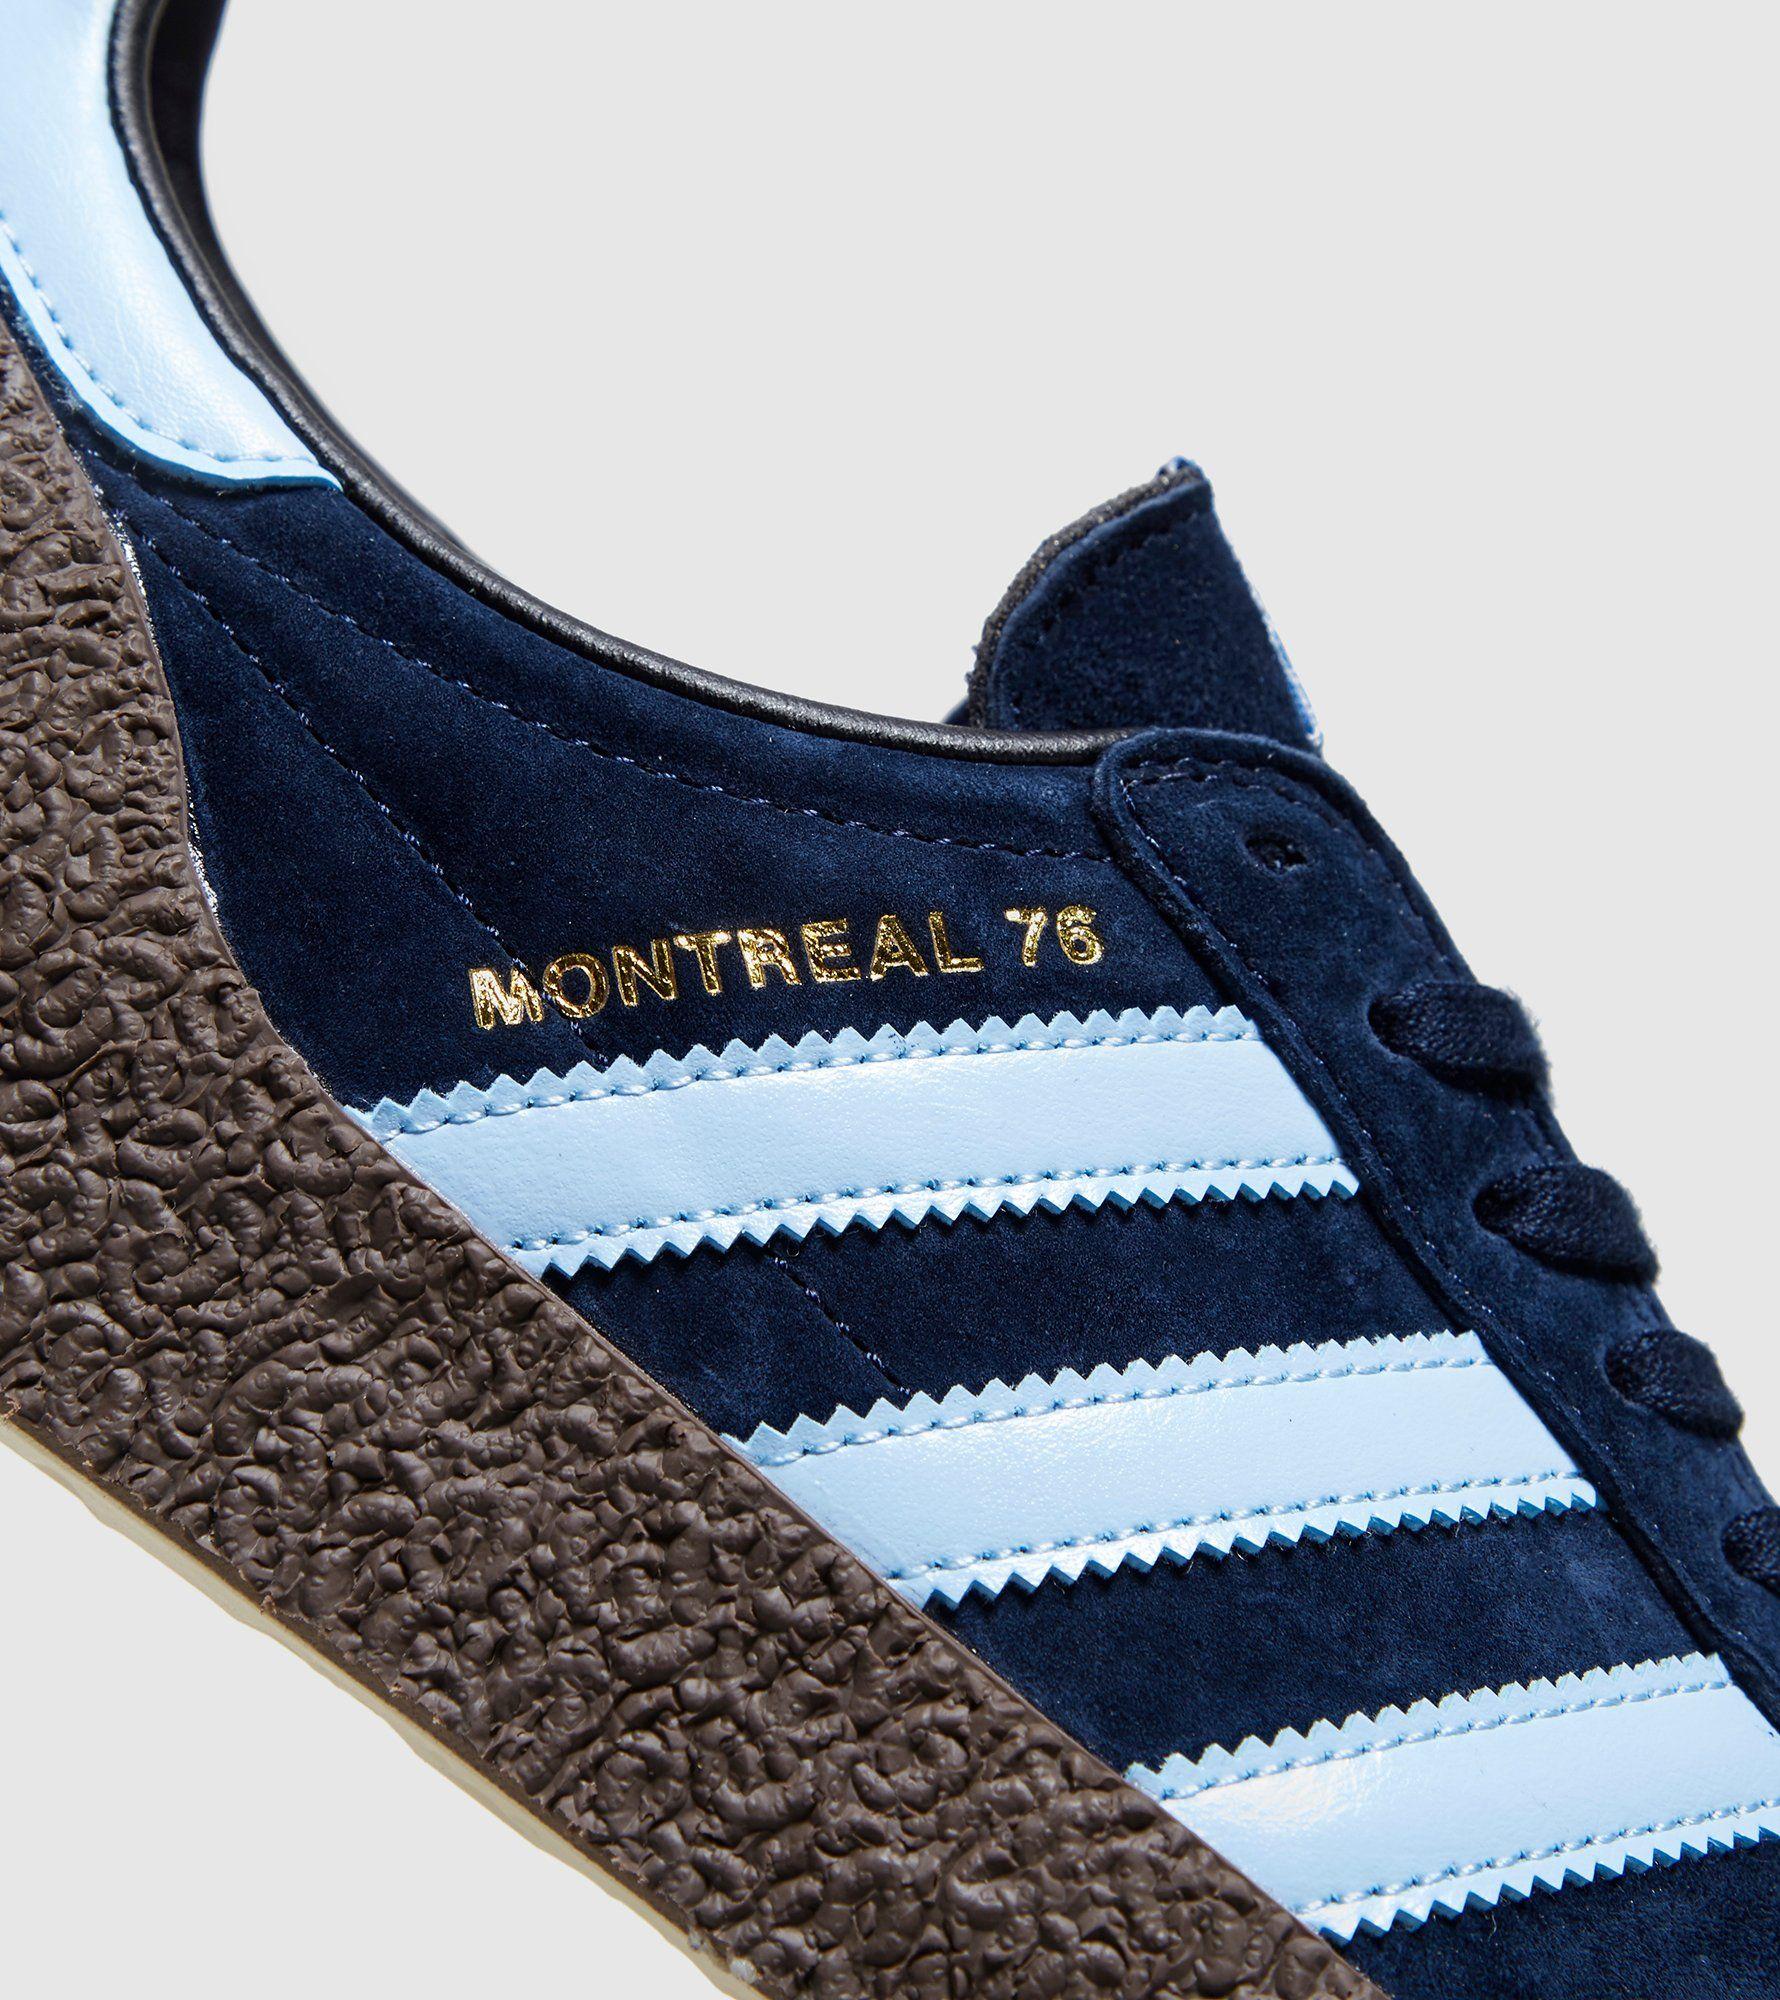 adidas Originals Montreal '76